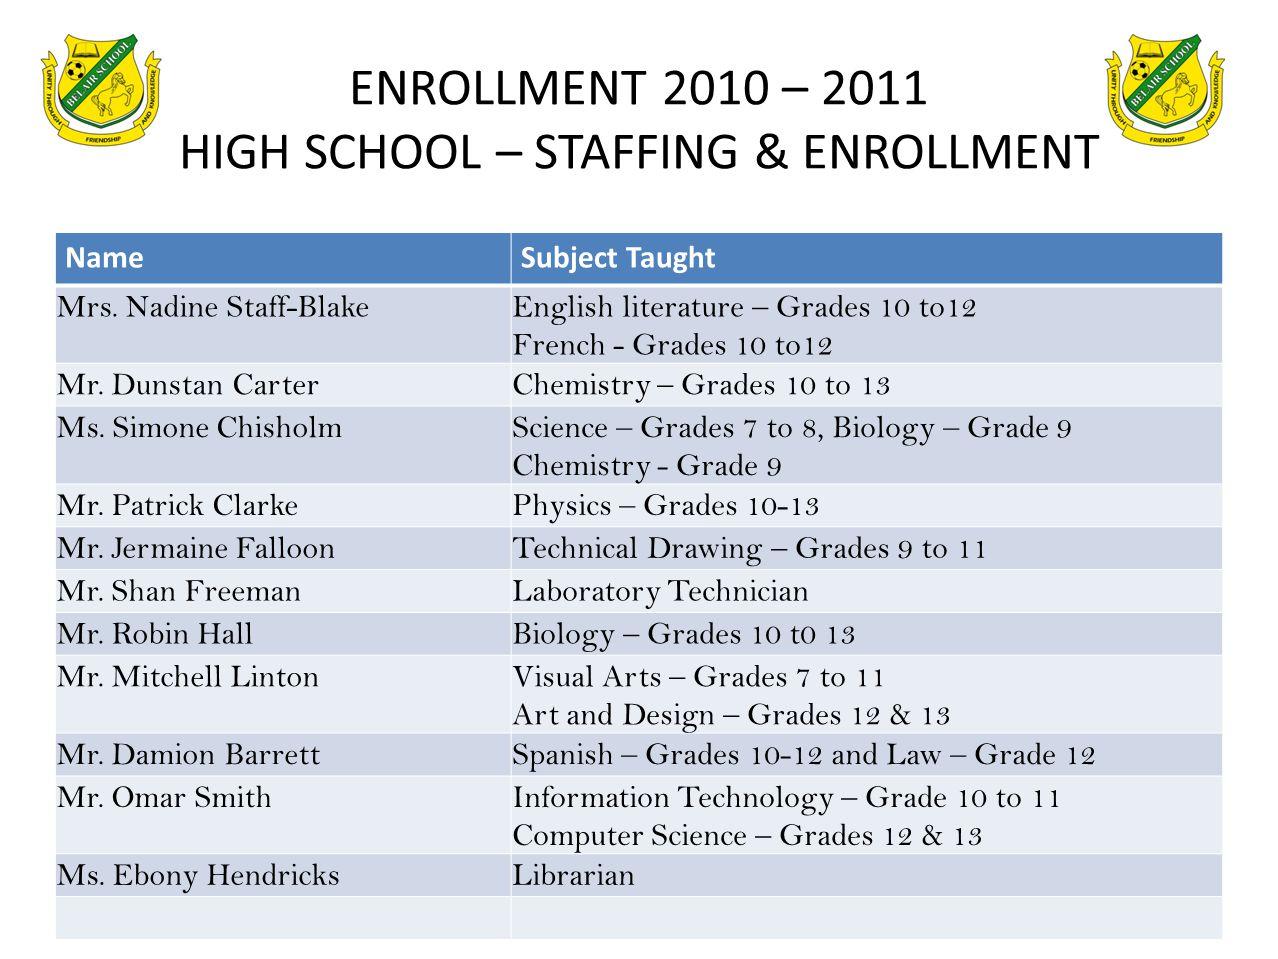 ENROLLMENT 2010 – 2011 HIGH SCHOOL – STAFFING & ENROLLMENT